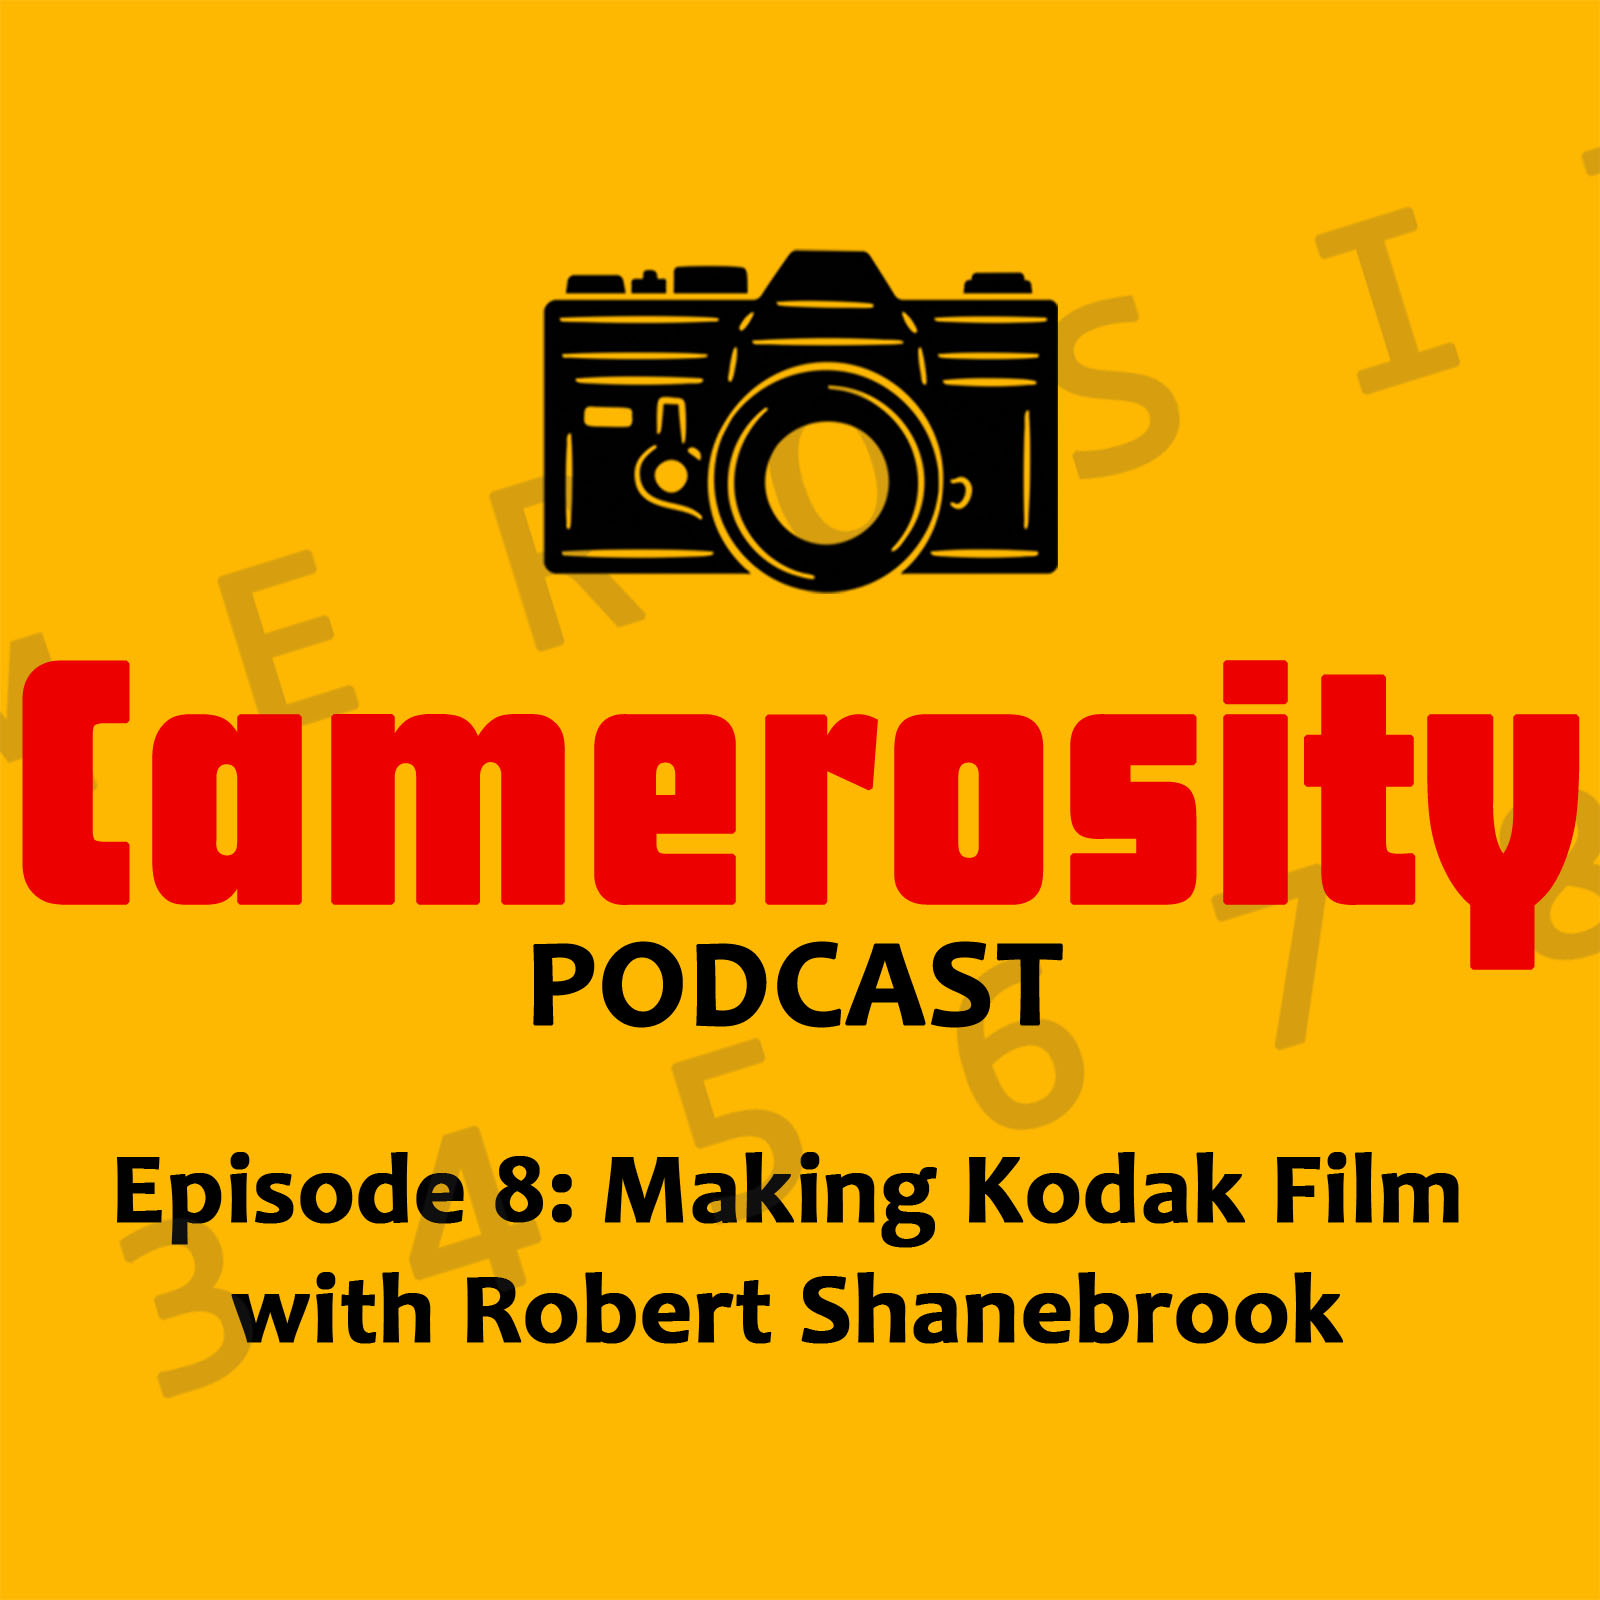 Episode 8: Making Kodak Film with Robert Shanebrook